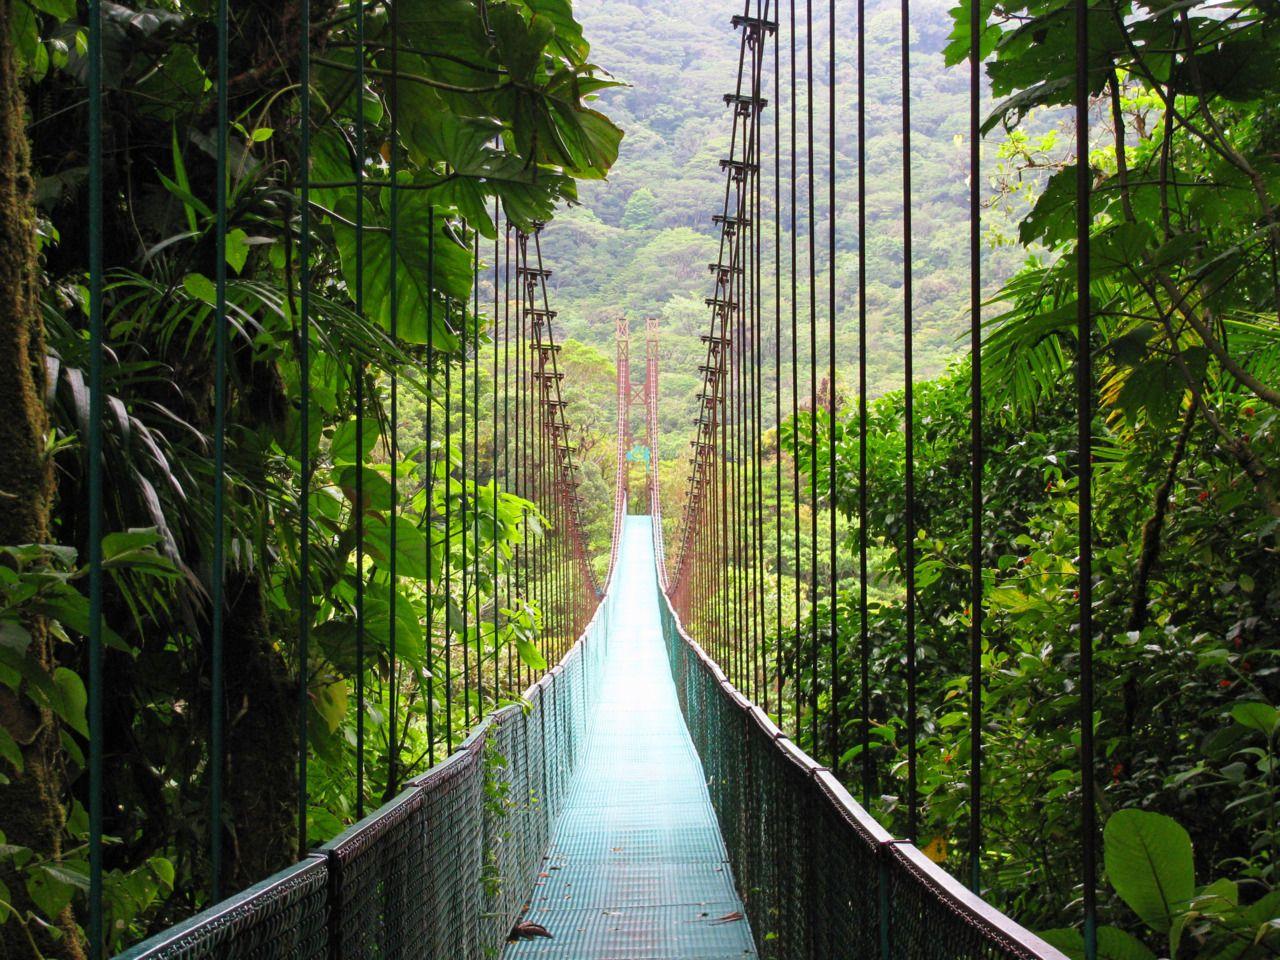 Costa Rica,Central America,Rainforest,Jungle